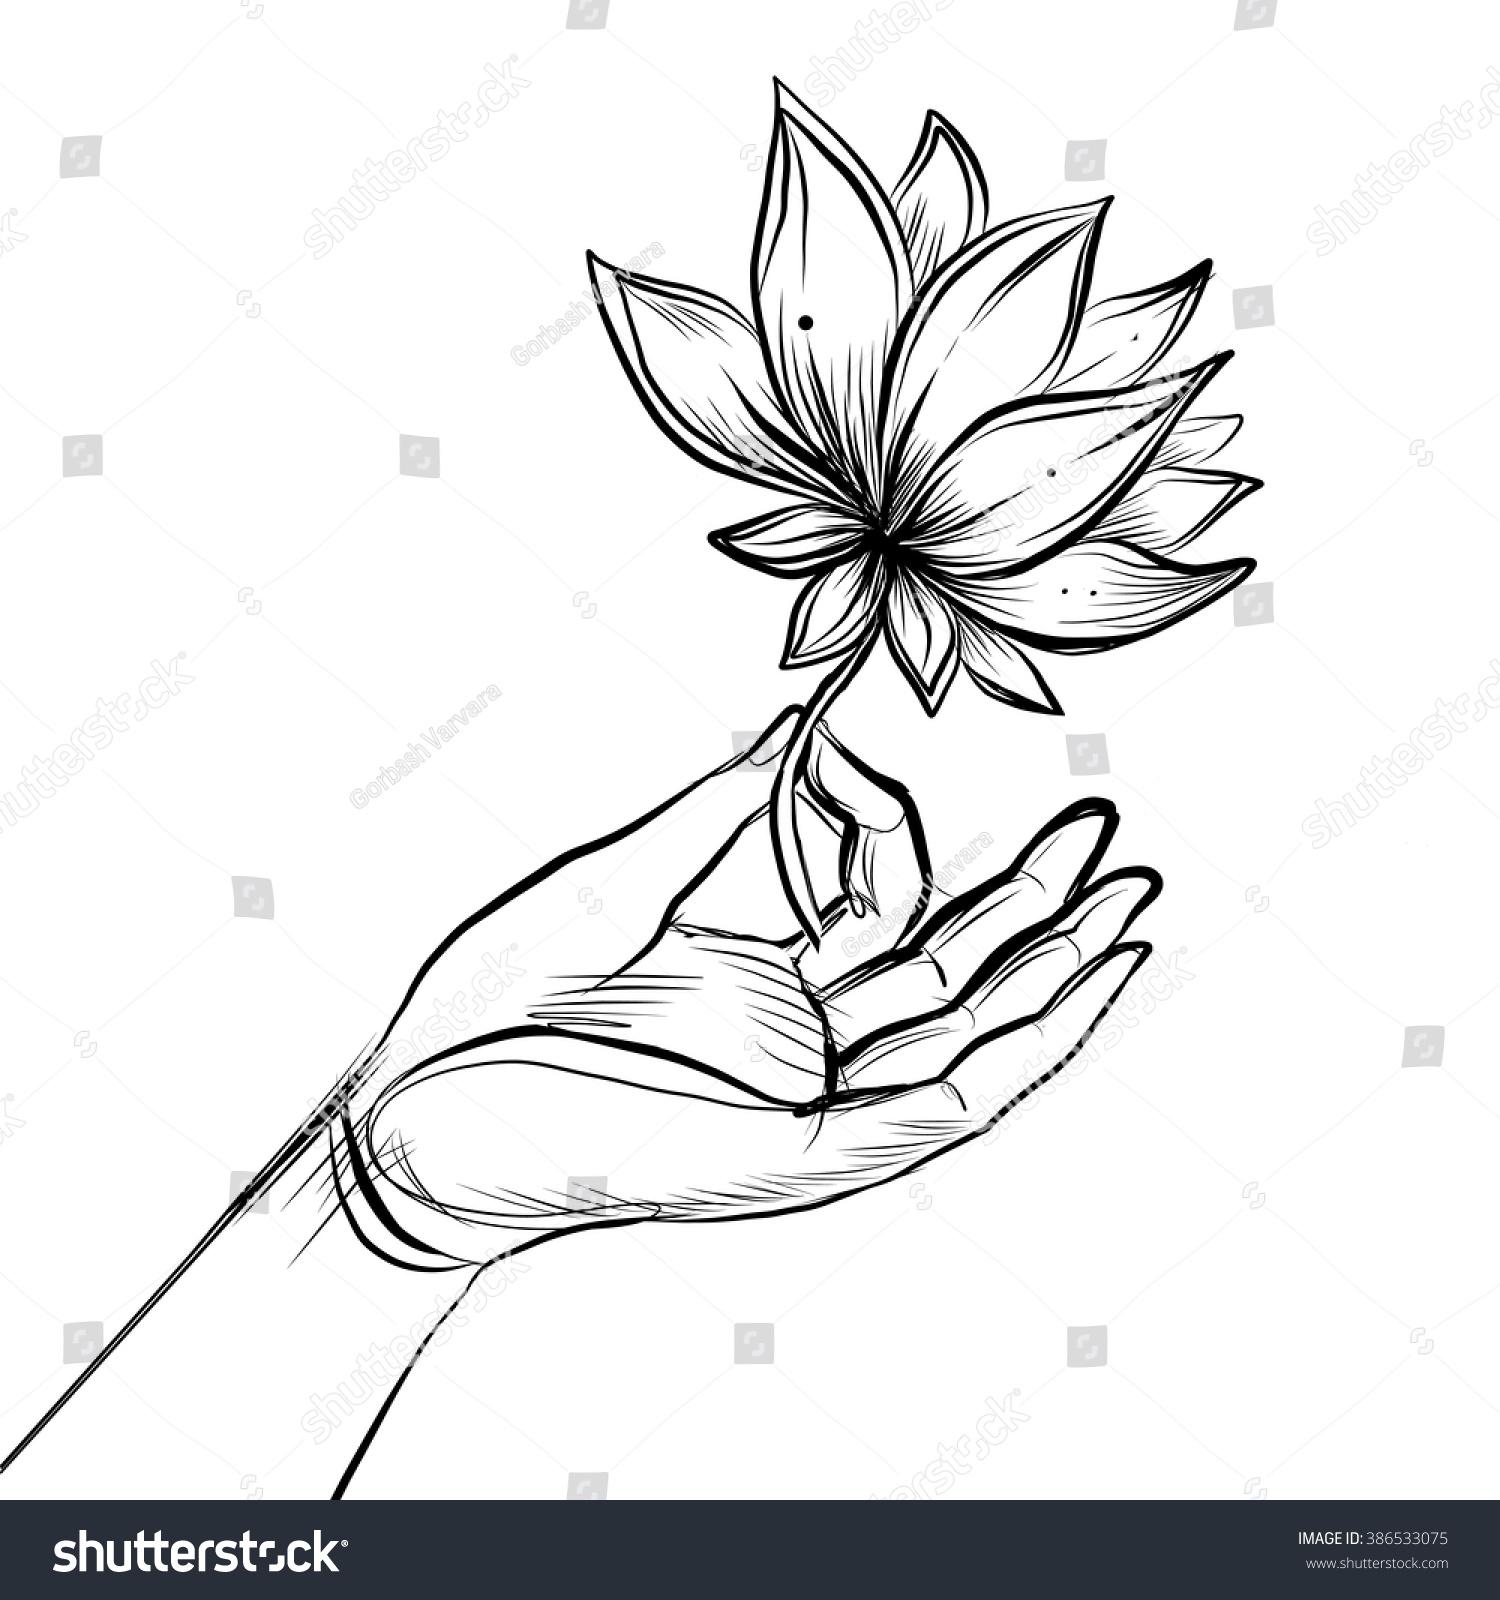 Lord buddhas hand holding lotus flower stock vector 386533075 lord buddhas hand holding lotus flower isolated vector illustration of mudra hindu motifs dhlflorist Gallery